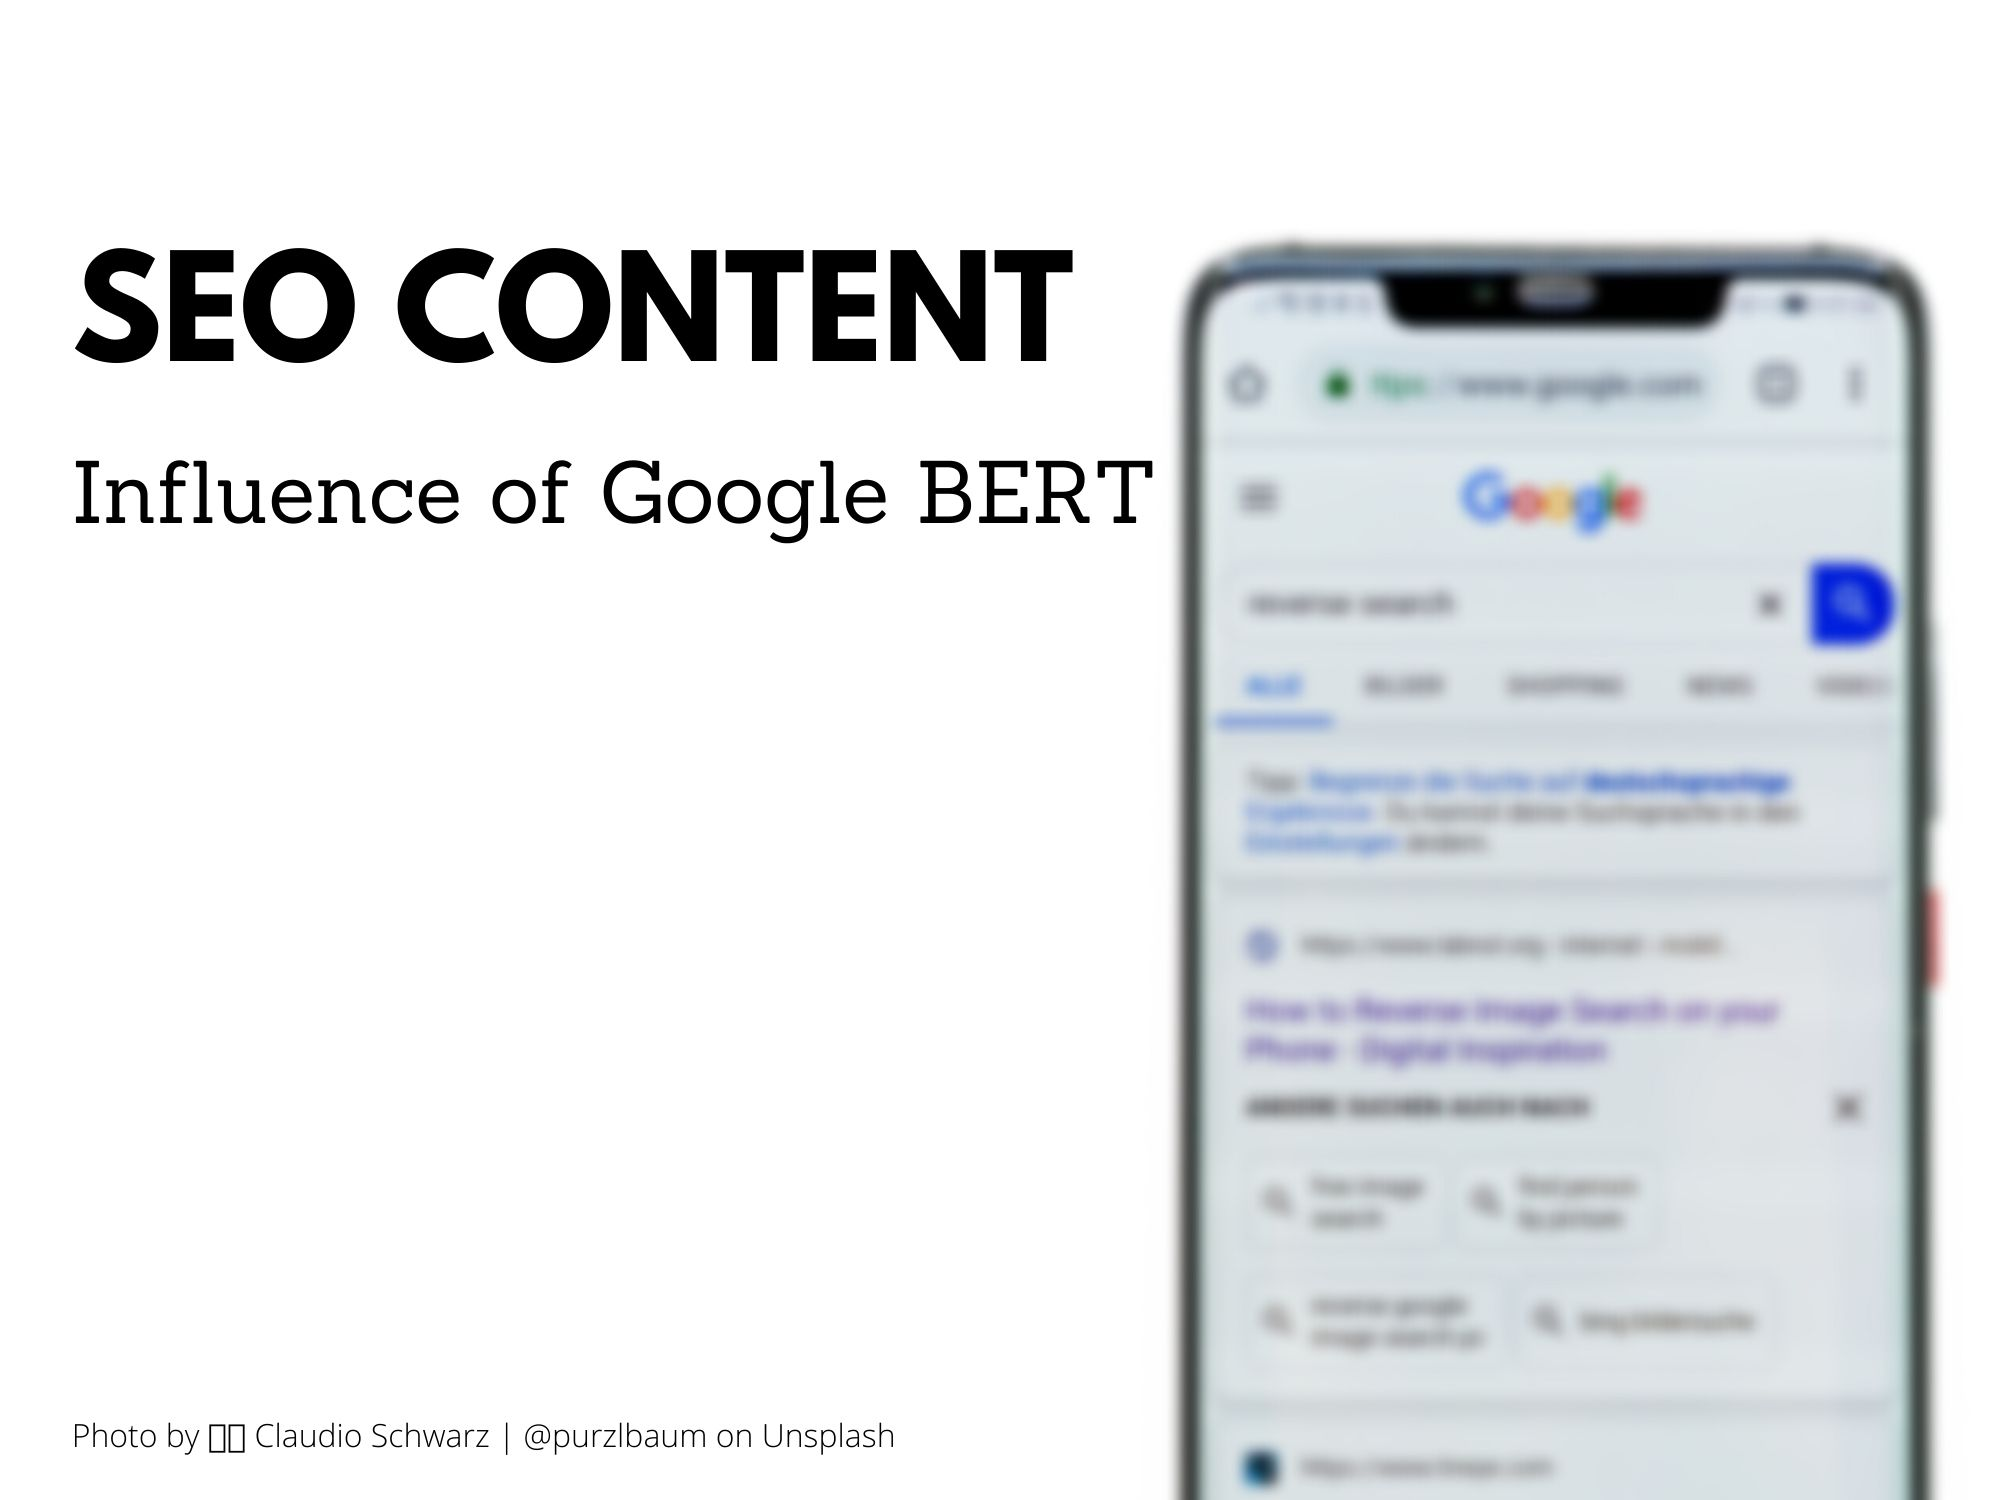 Influence of Google BERT on SEO Content